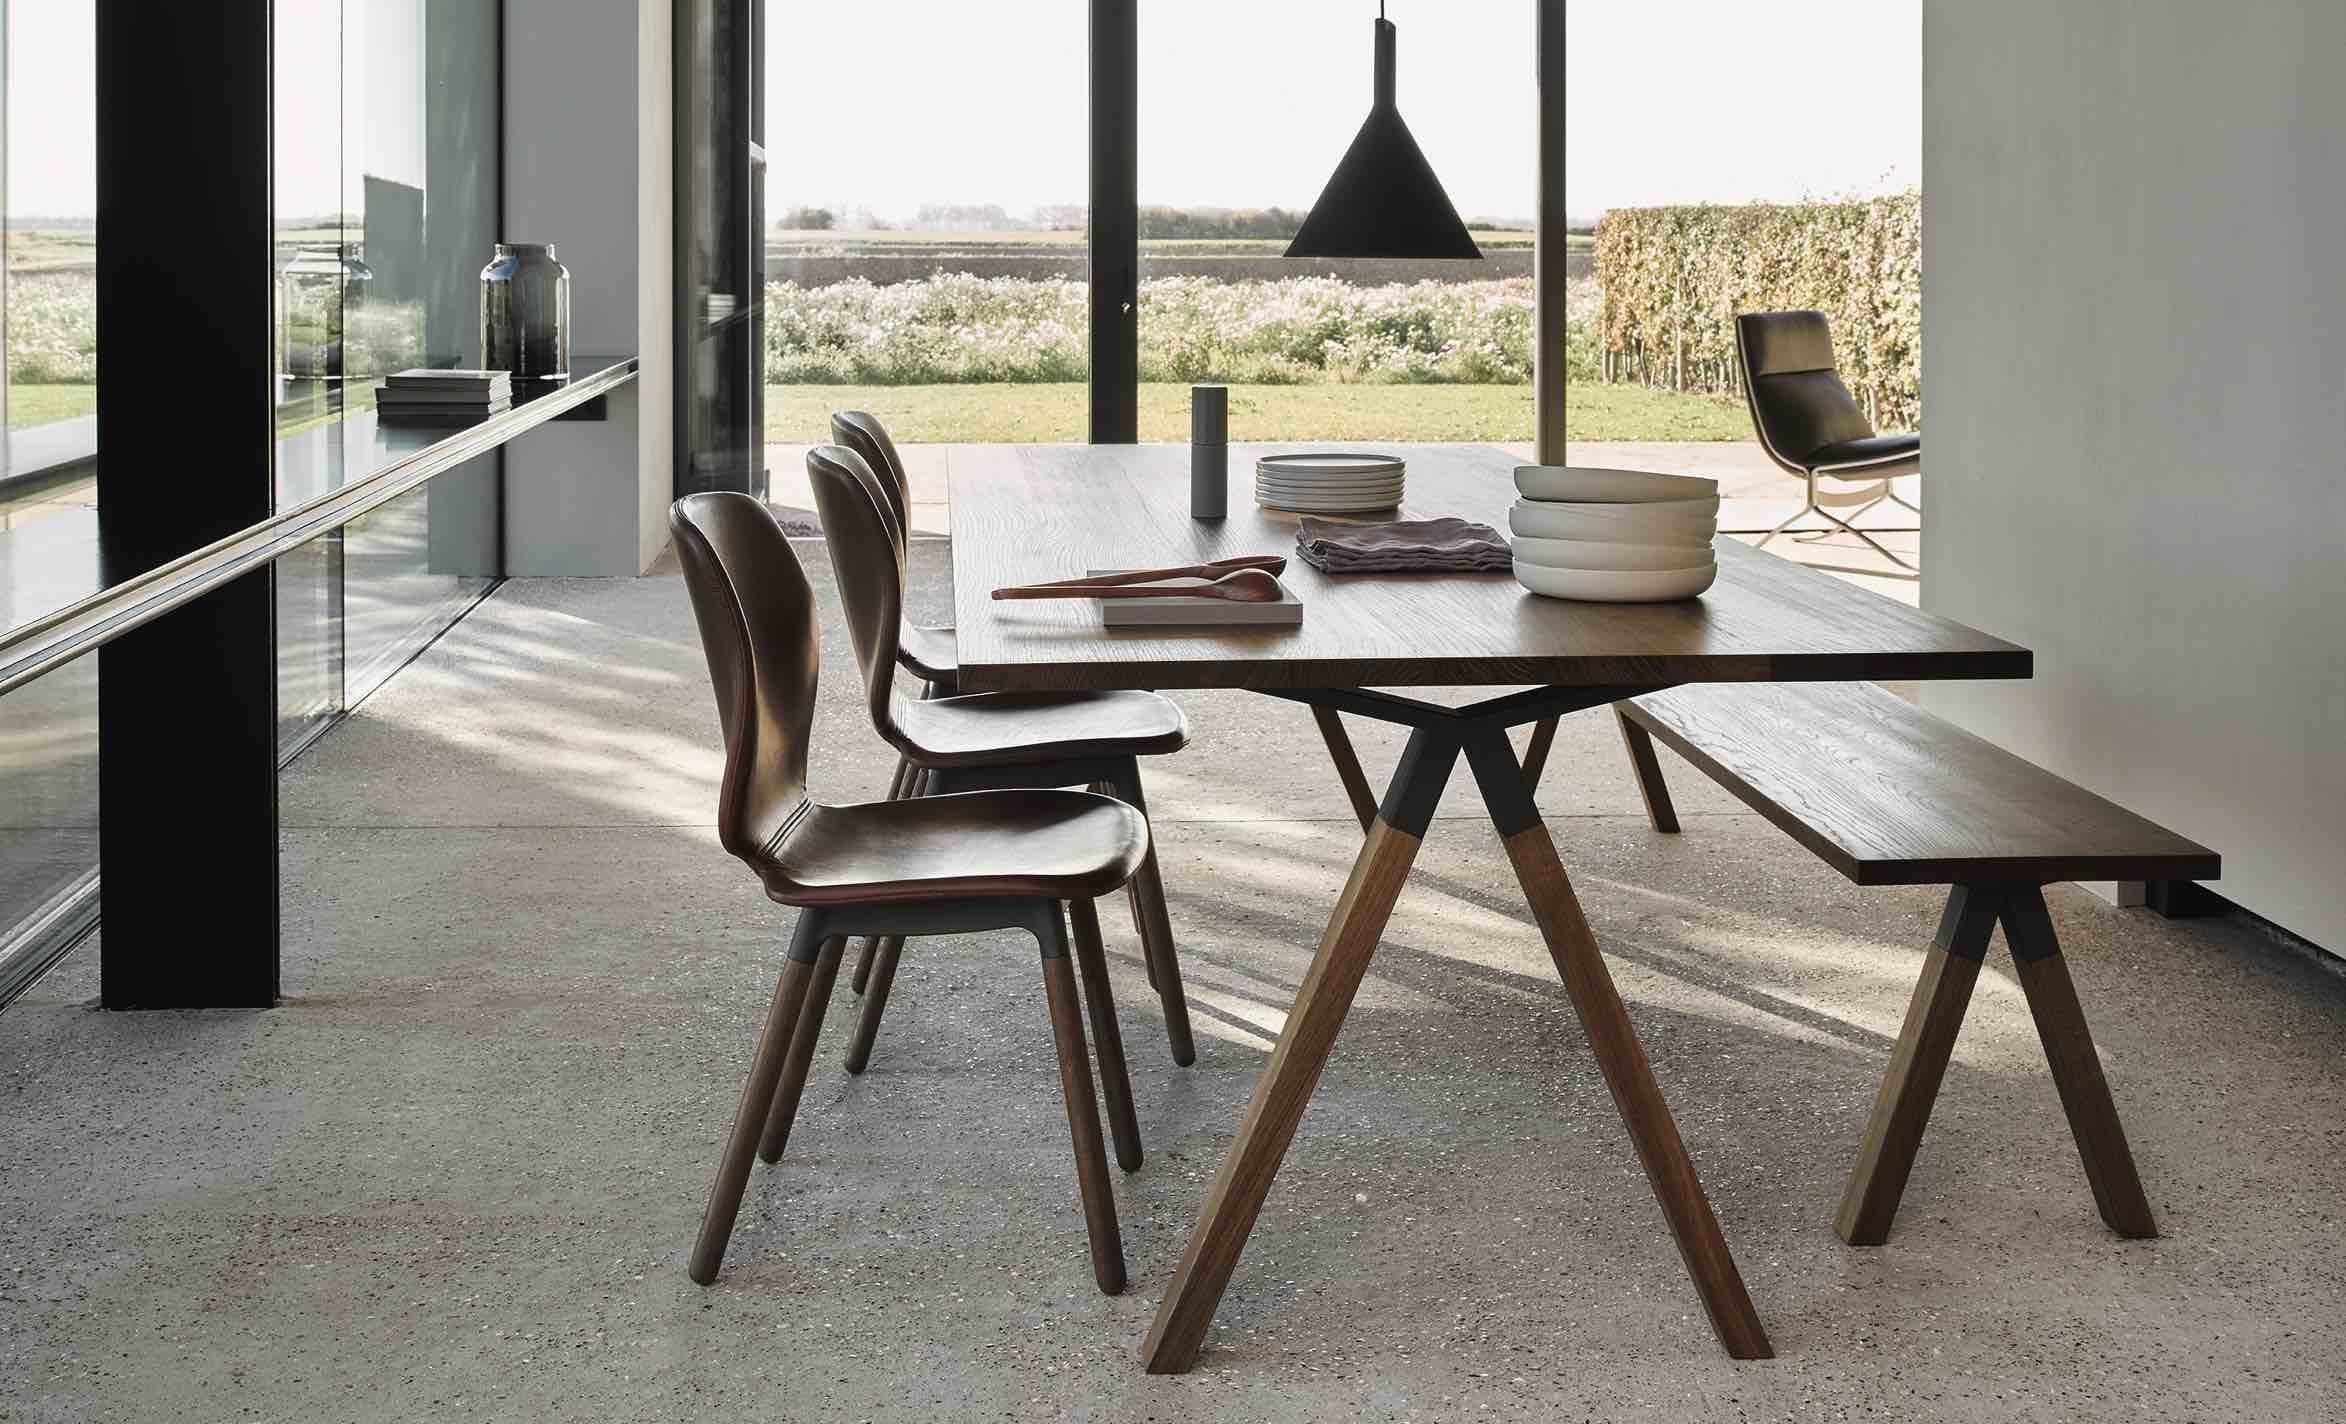 EYYE Ninove tafel stoelen fauteuils